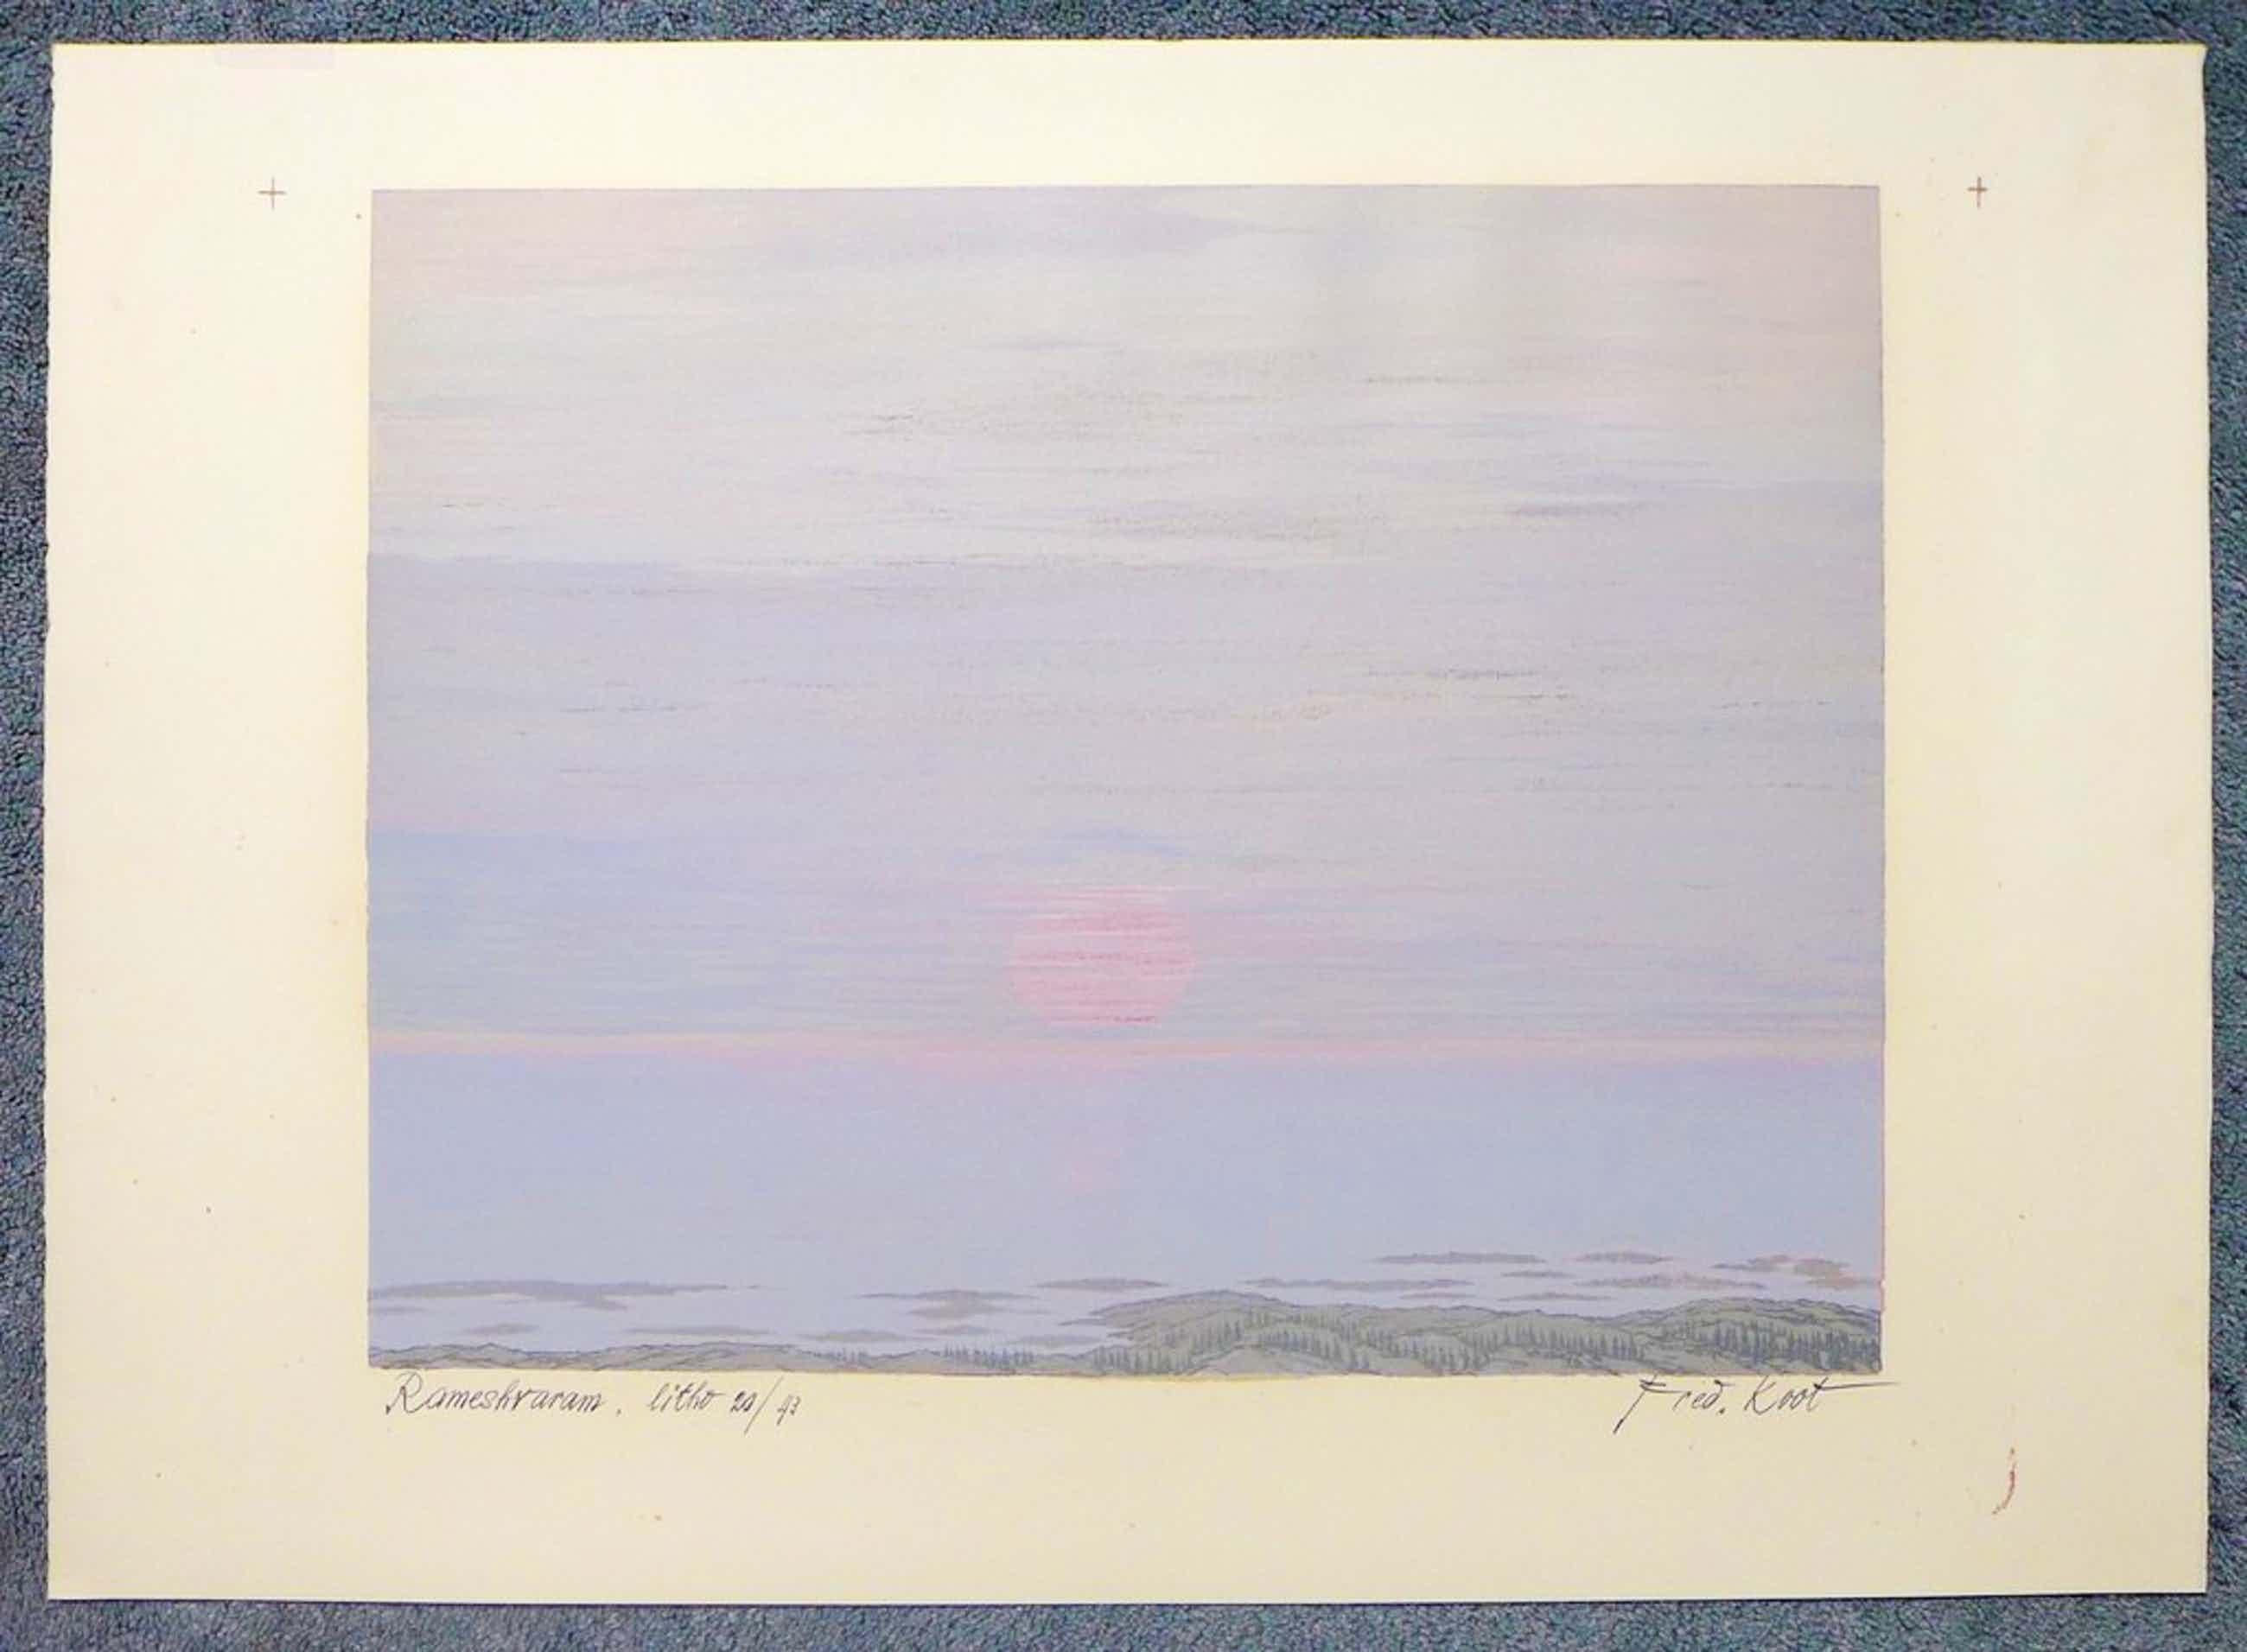 Fred Koot - Fred Koot, litho, titel Rameshraram oplage 20/43 beeldformaat 35 x 44.5 cm.  kopen? Bied vanaf 45!